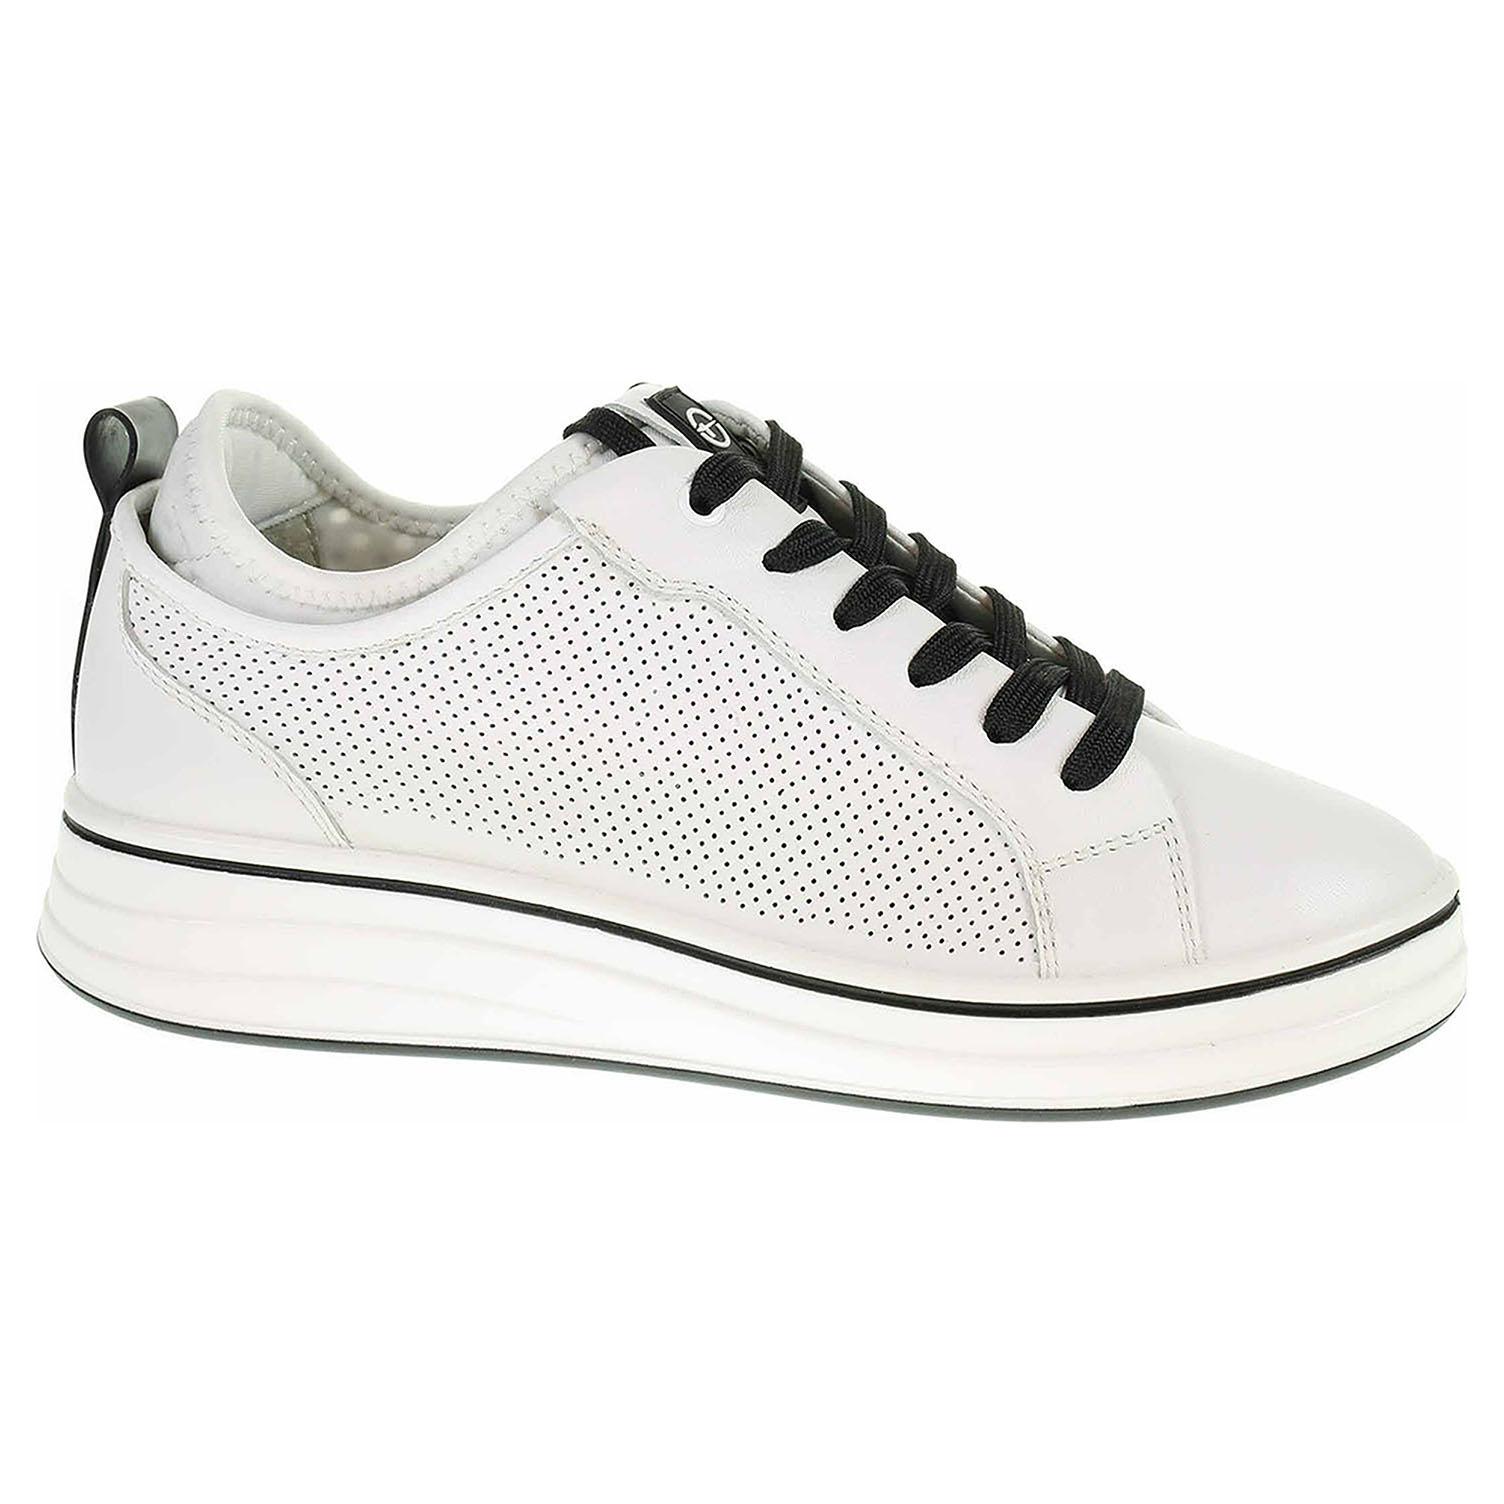 Dámská obuv Tamaris 1-23716-24 white-black 1-1-23716-24 125 39